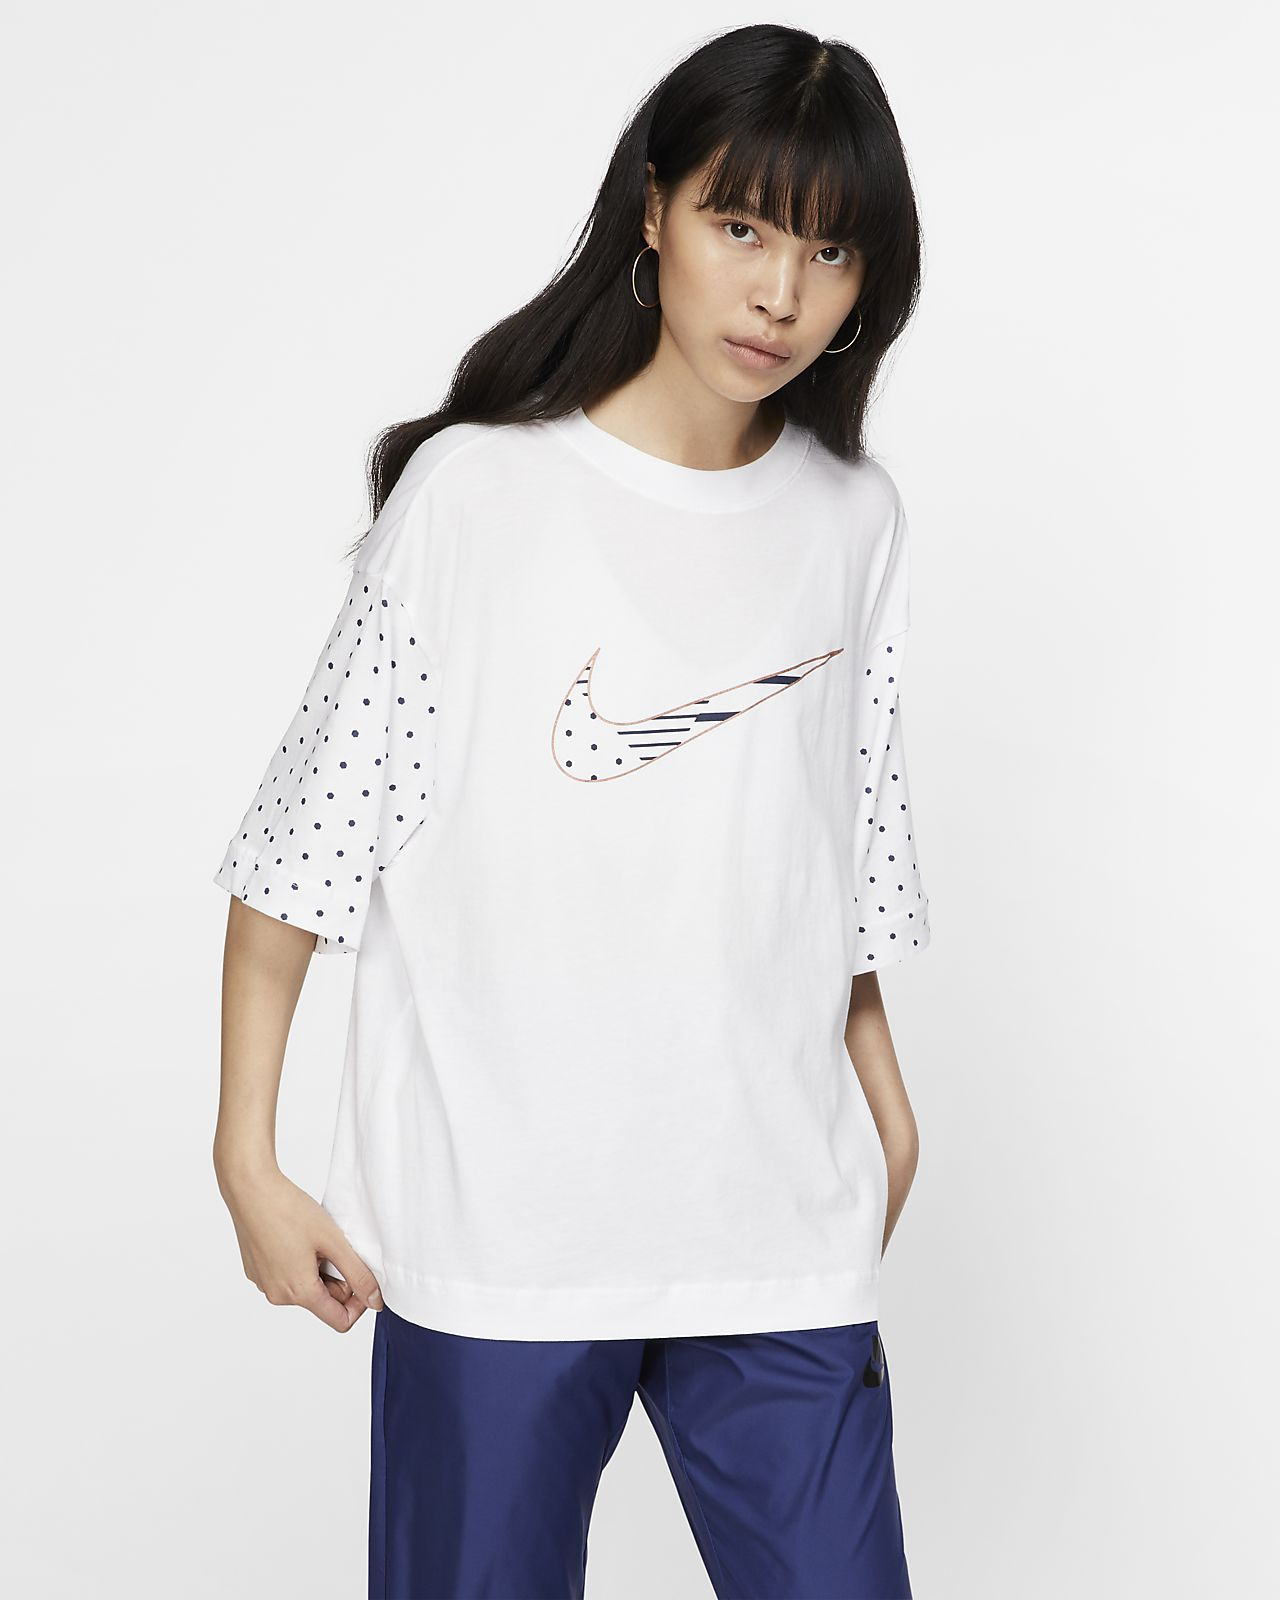 Dámské tričko Nike Sportswear Essential s krátkým rukávem